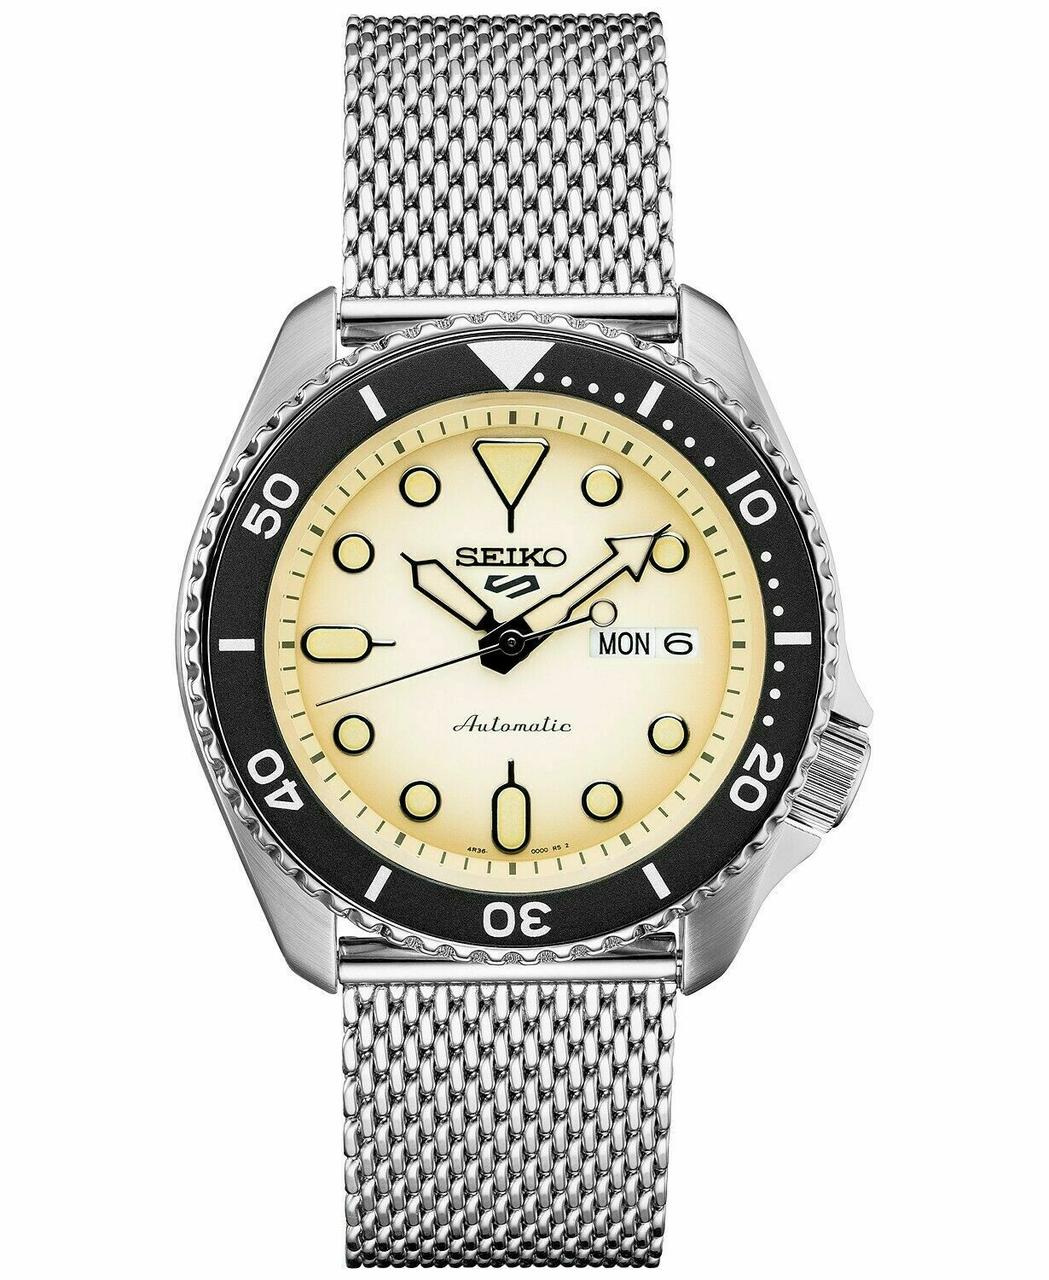 Часы Seiko 5 Sports SRPD67 Automatic 4R36